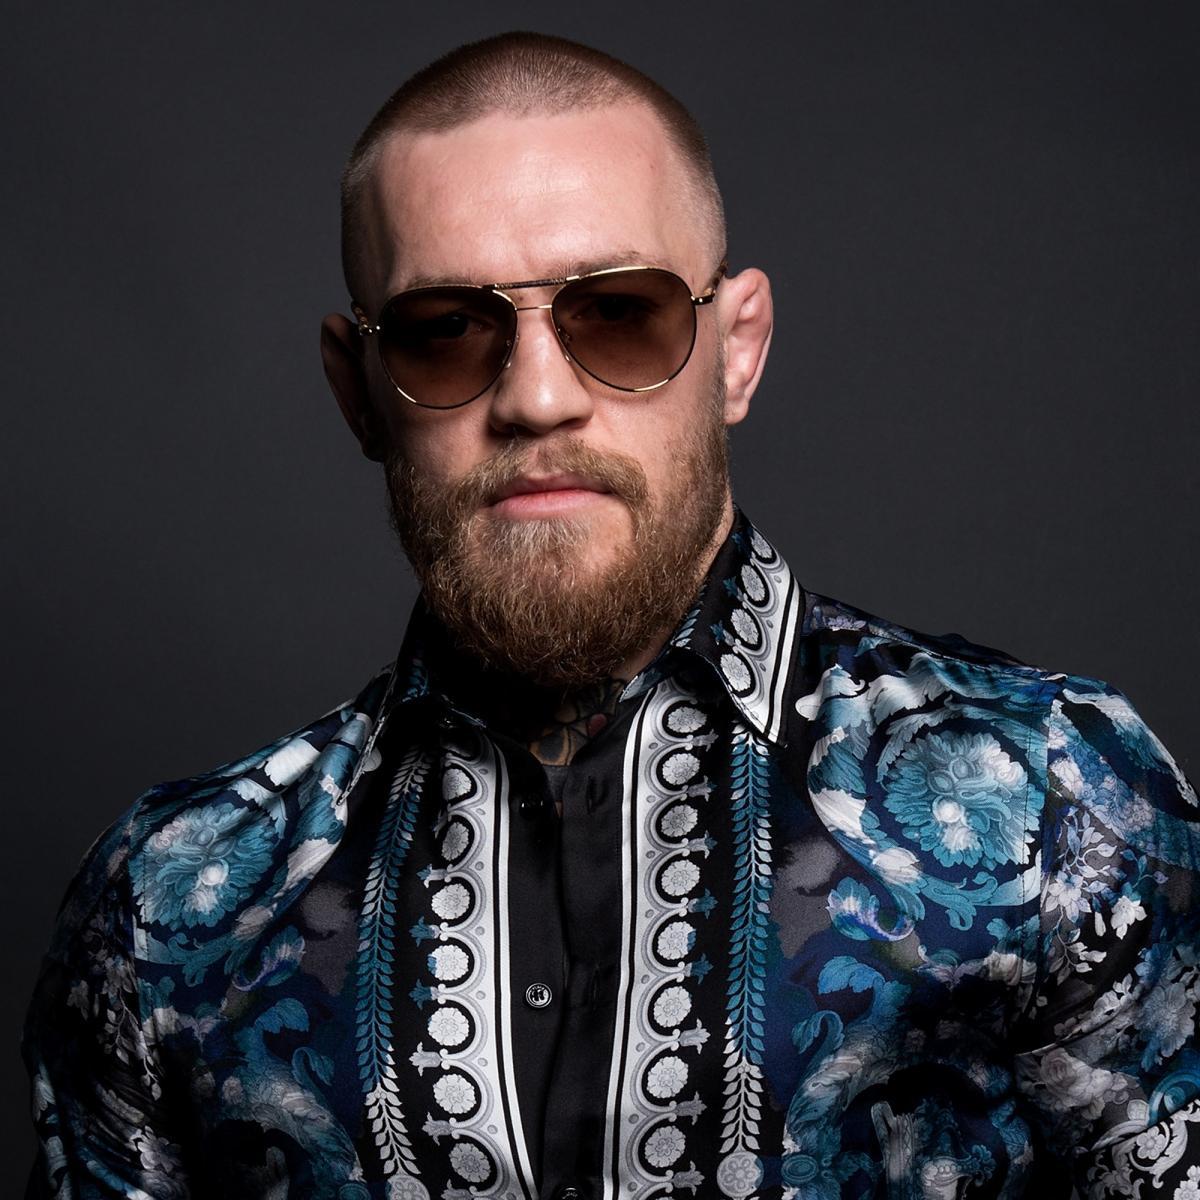 Welp Conor McGregor Tweets Picture from Random Drug Test Ahead of UFC CV-48